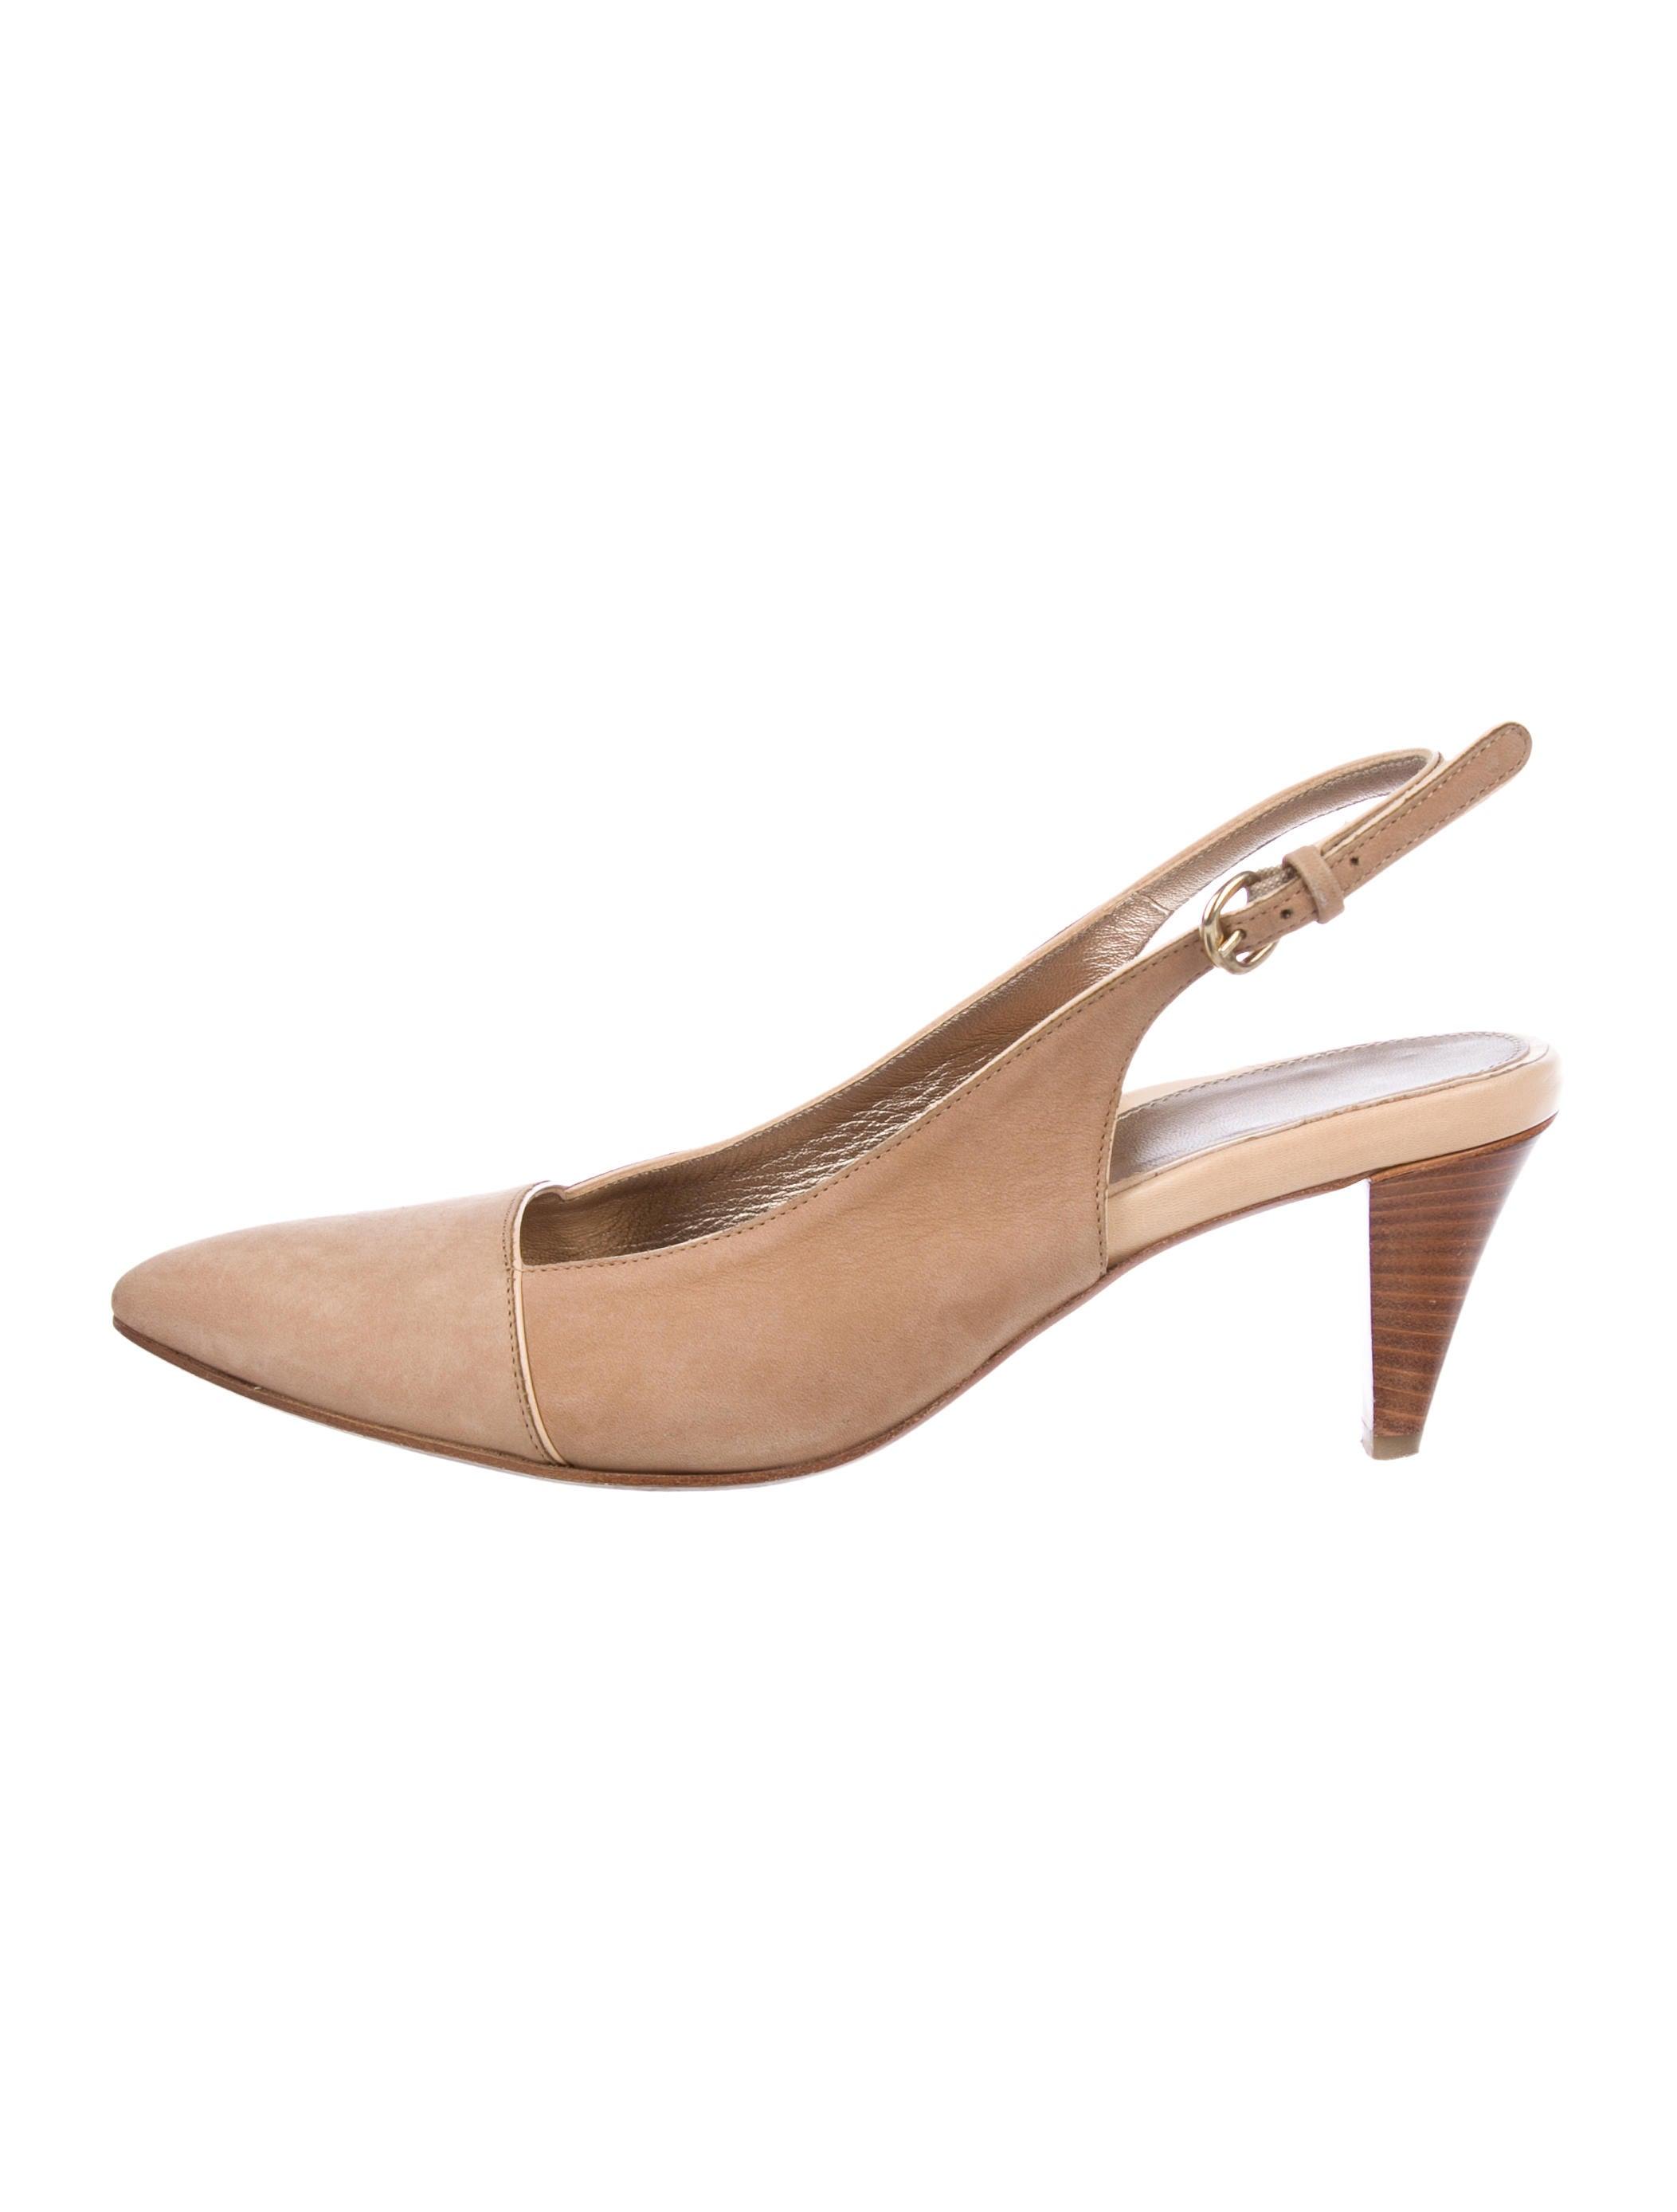 7c3caa7e6bf Dana Davis Suede Slingback Pumps - Shoes - WDANA20007